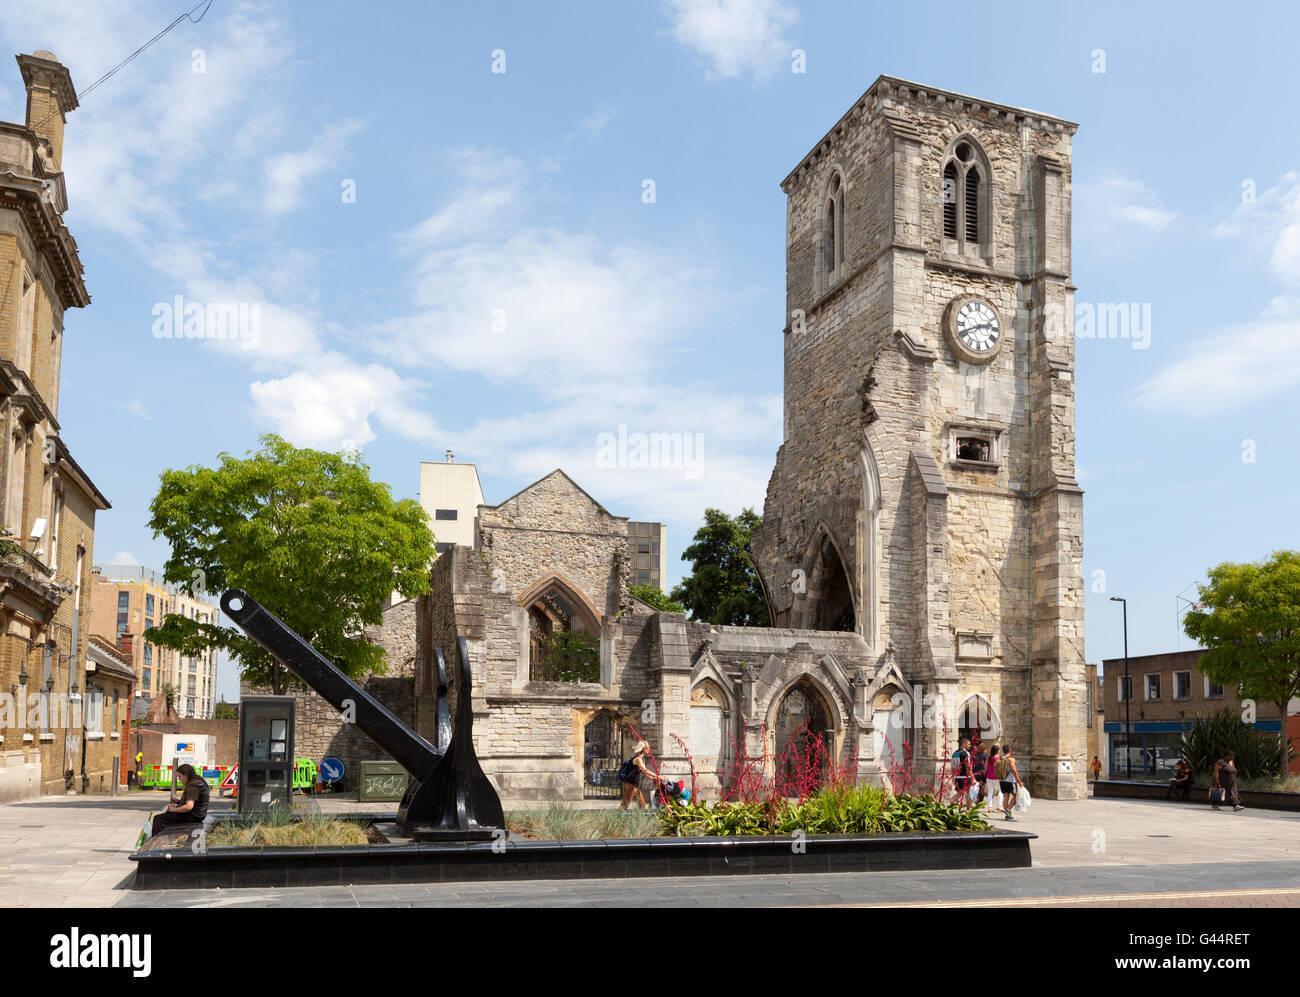 Église Saint Rood à Southampton, Hampshire, Royaume-Uni Photo Stock